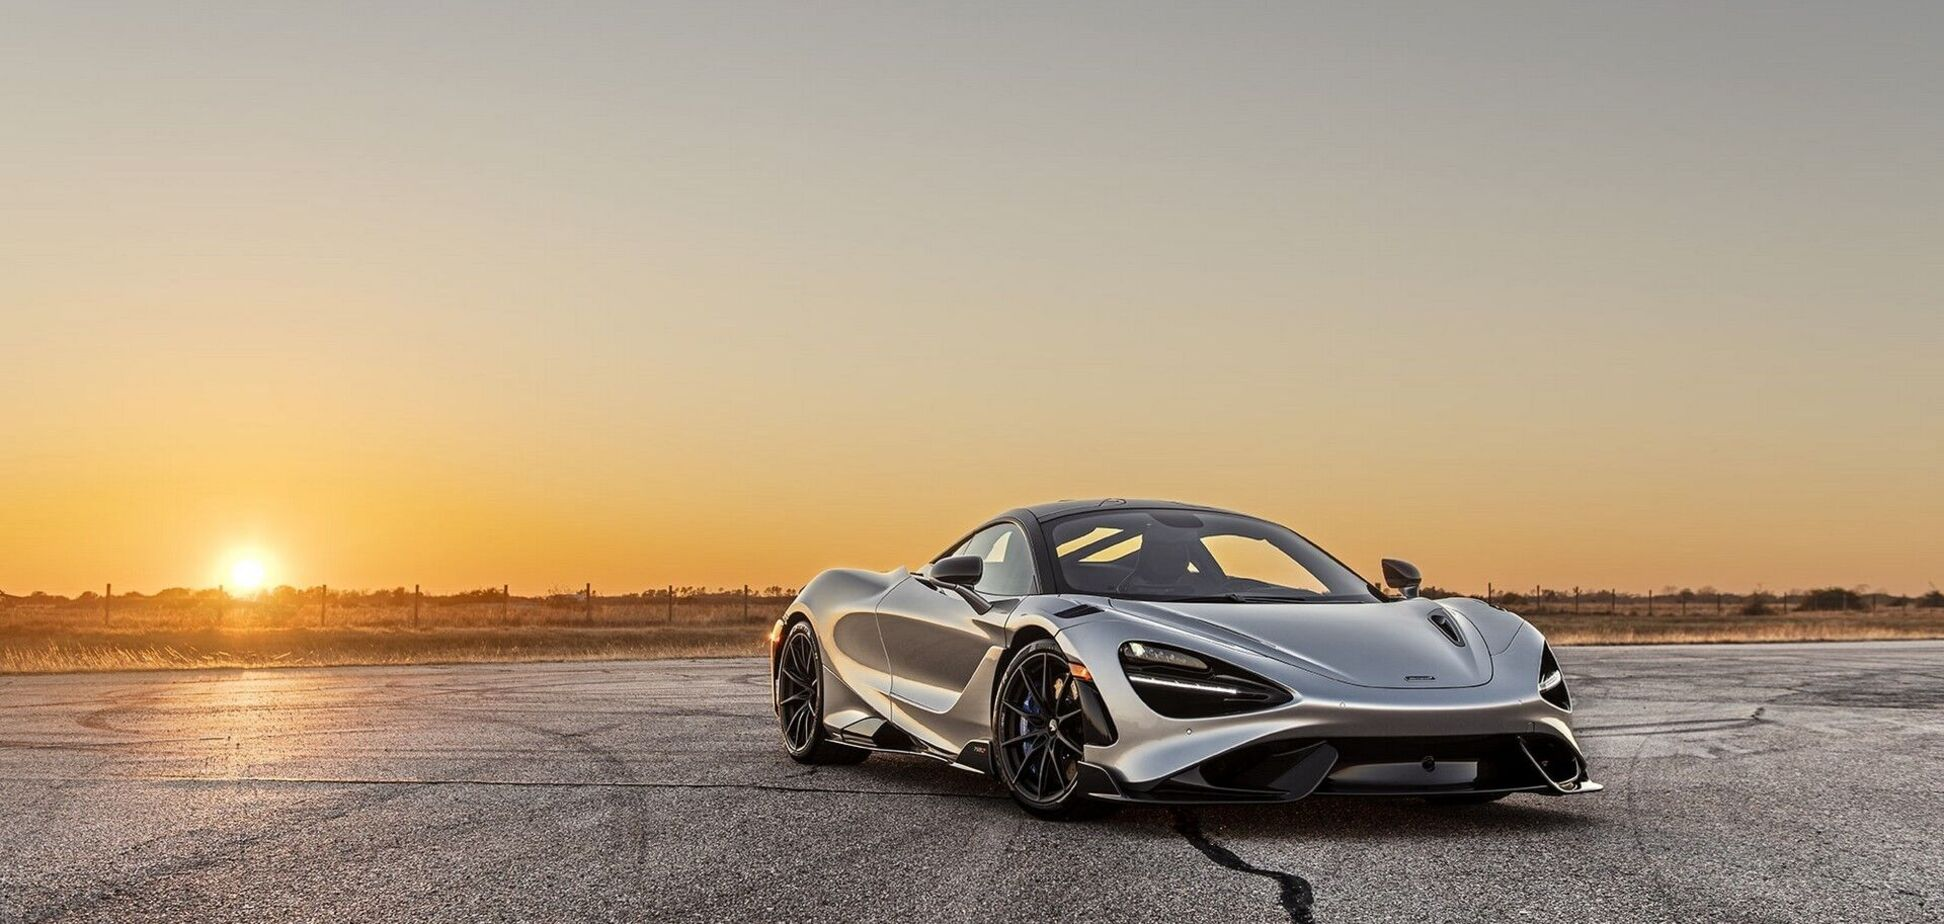 Hennessey 'прокачала' McLaren 765LT до 1015 л.с.